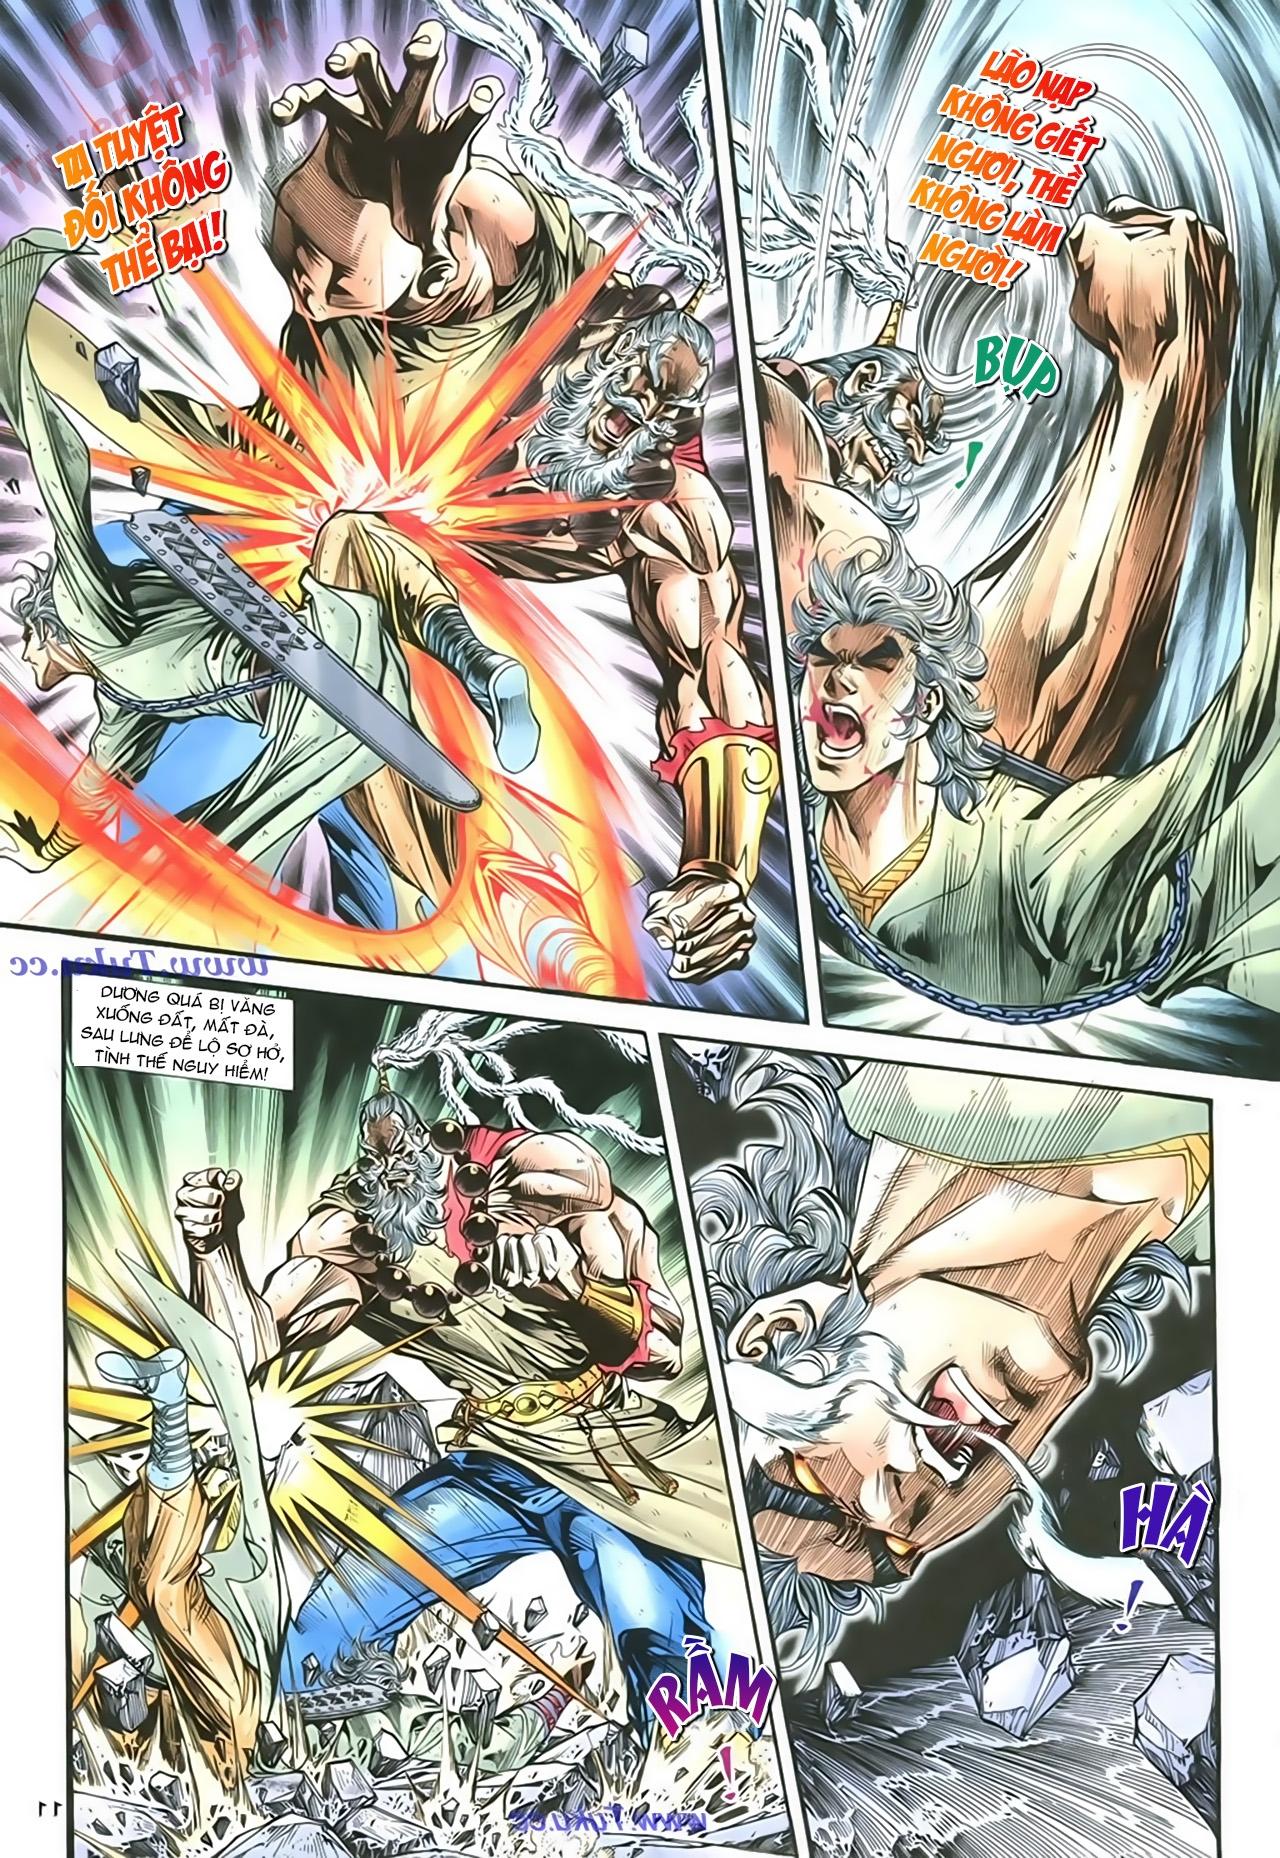 Thần Điêu Hiệp Lữ chap 86 – End Trang 11 - Mangak.info